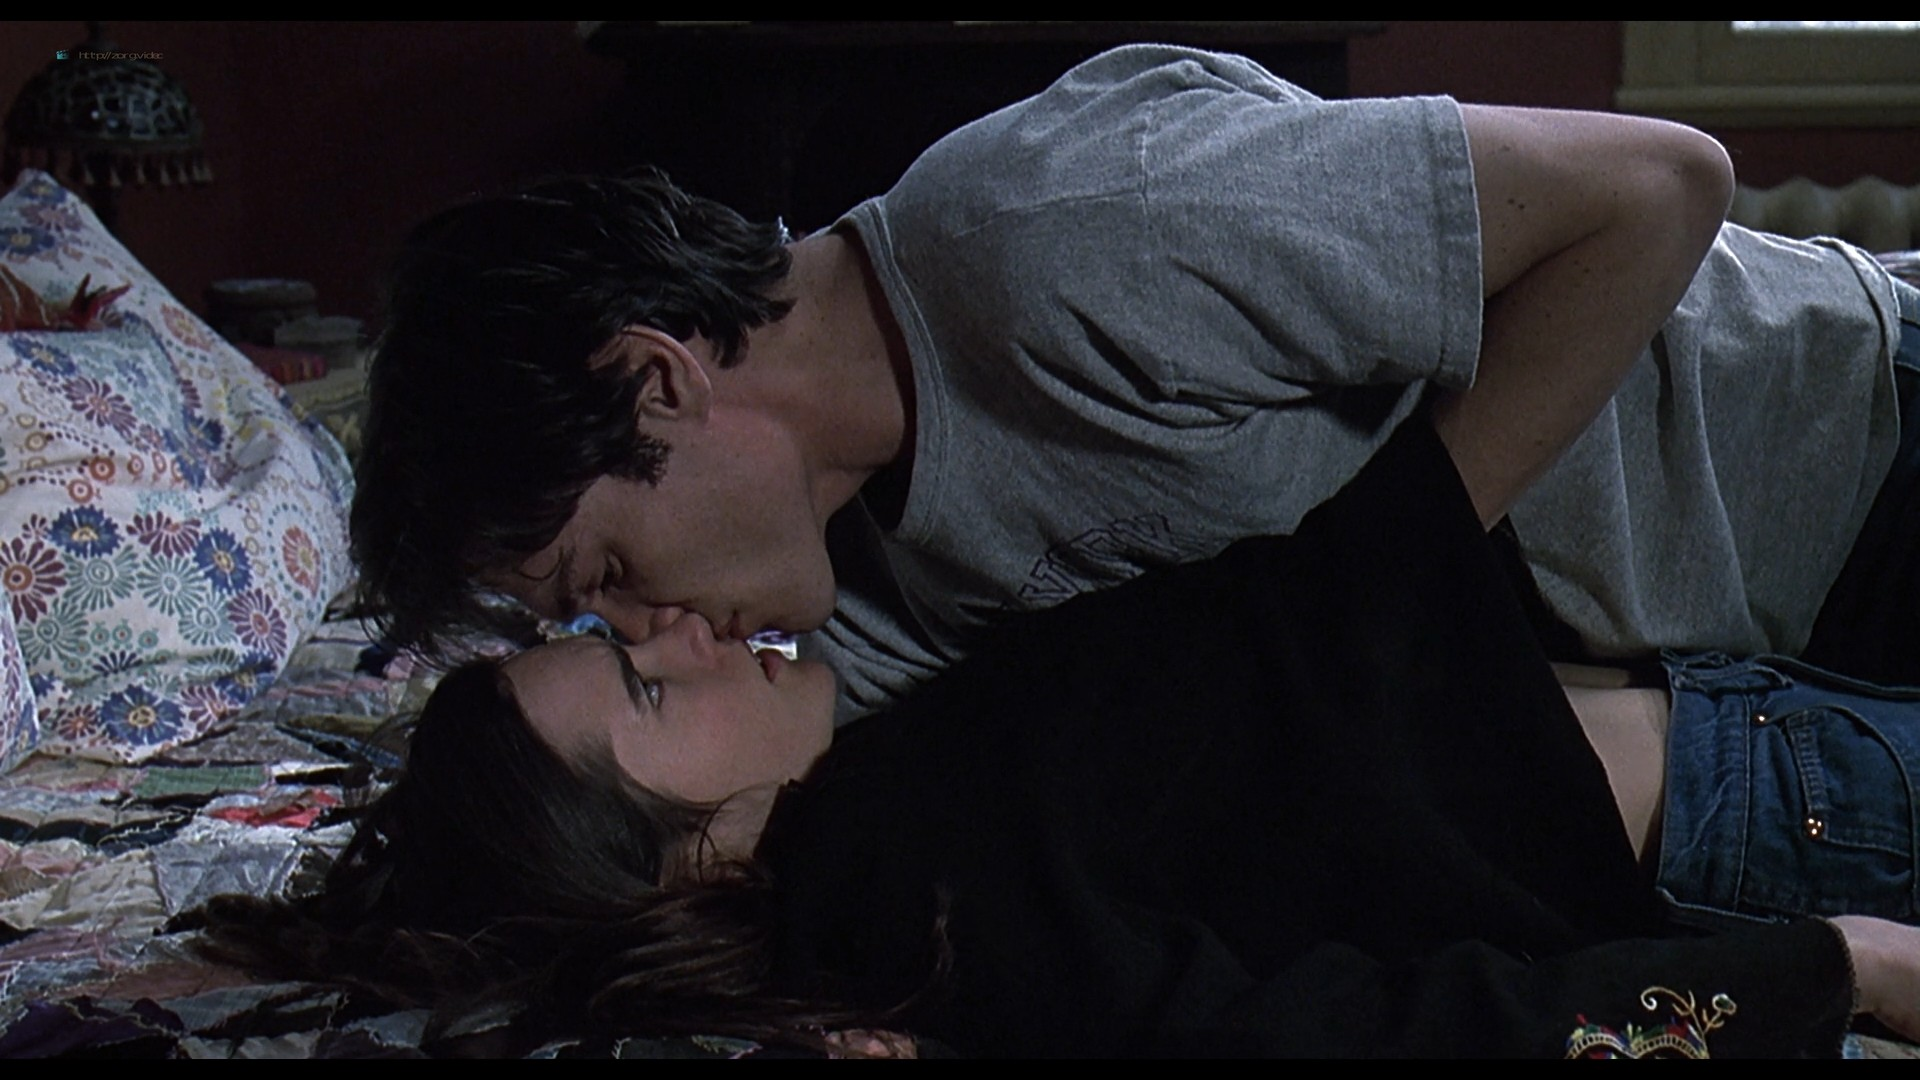 Jennifer Connelly nude side boob sex in – Waking the Dead (2000) HD 1080p BluRay (2)